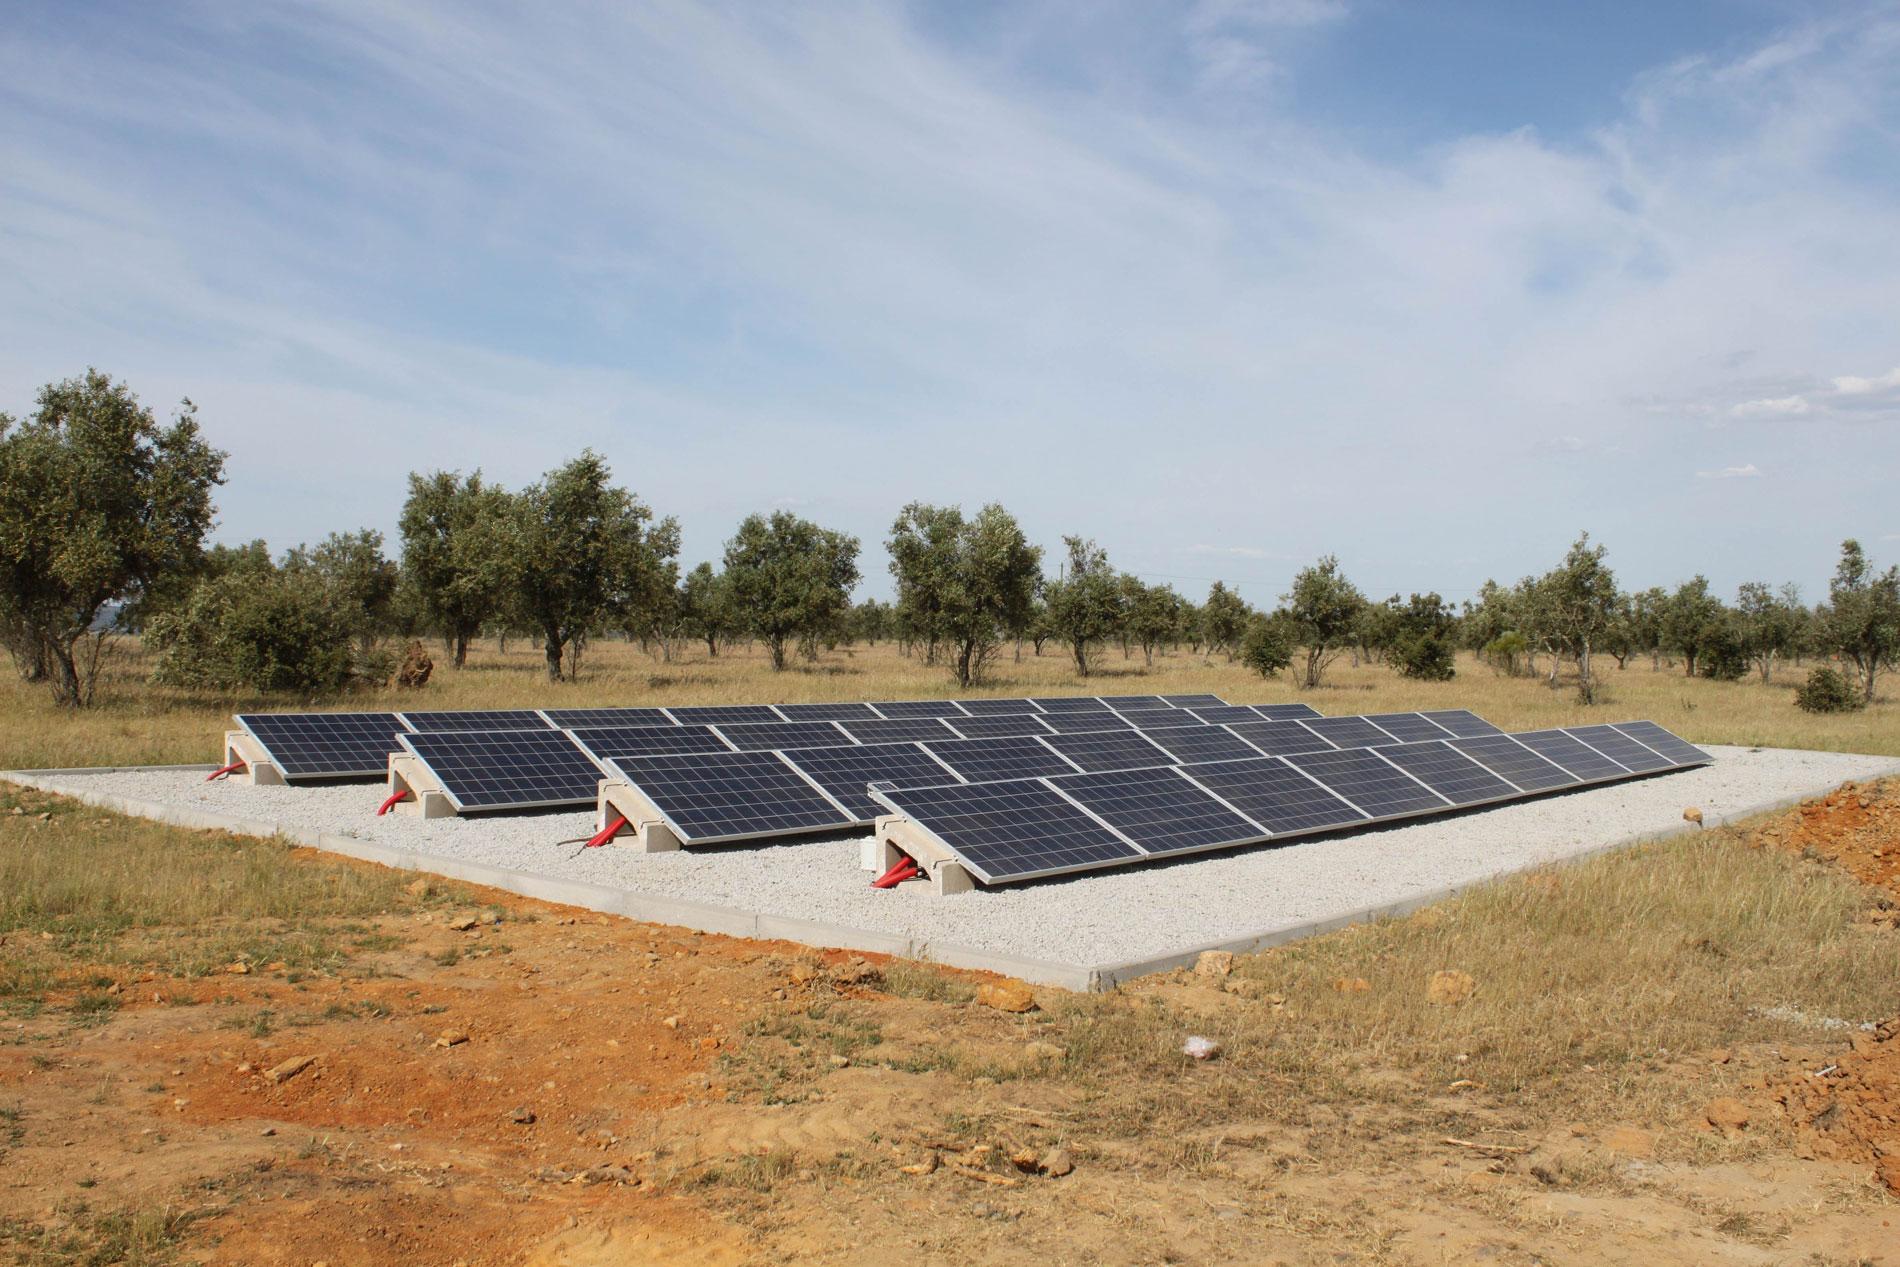 Soporte paneles solares fotovoltaicos SOLARBLOC